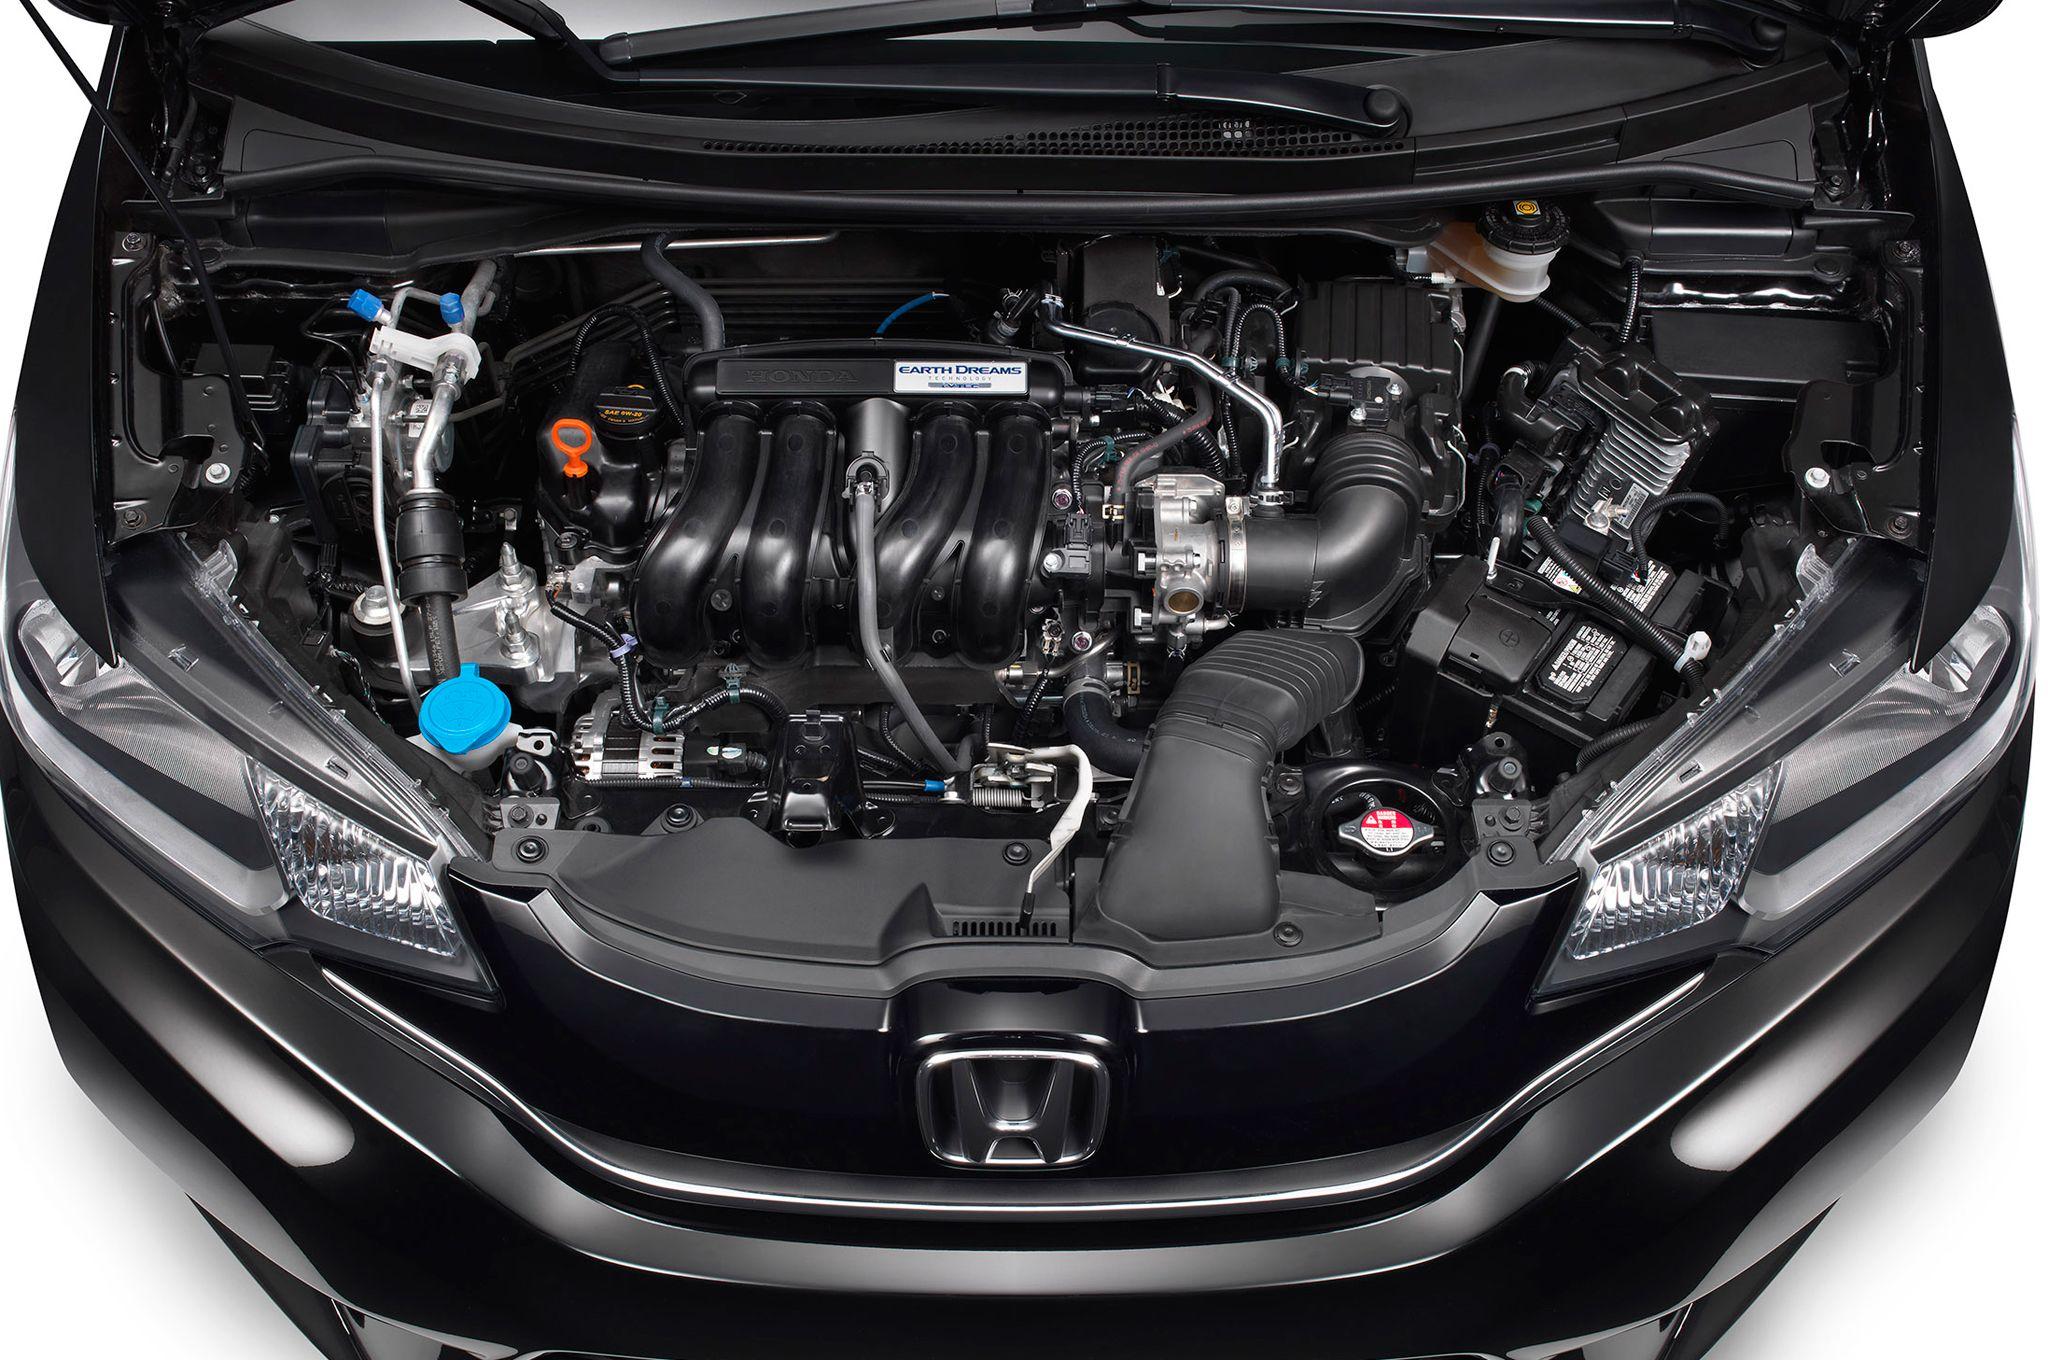 Honda fit engine